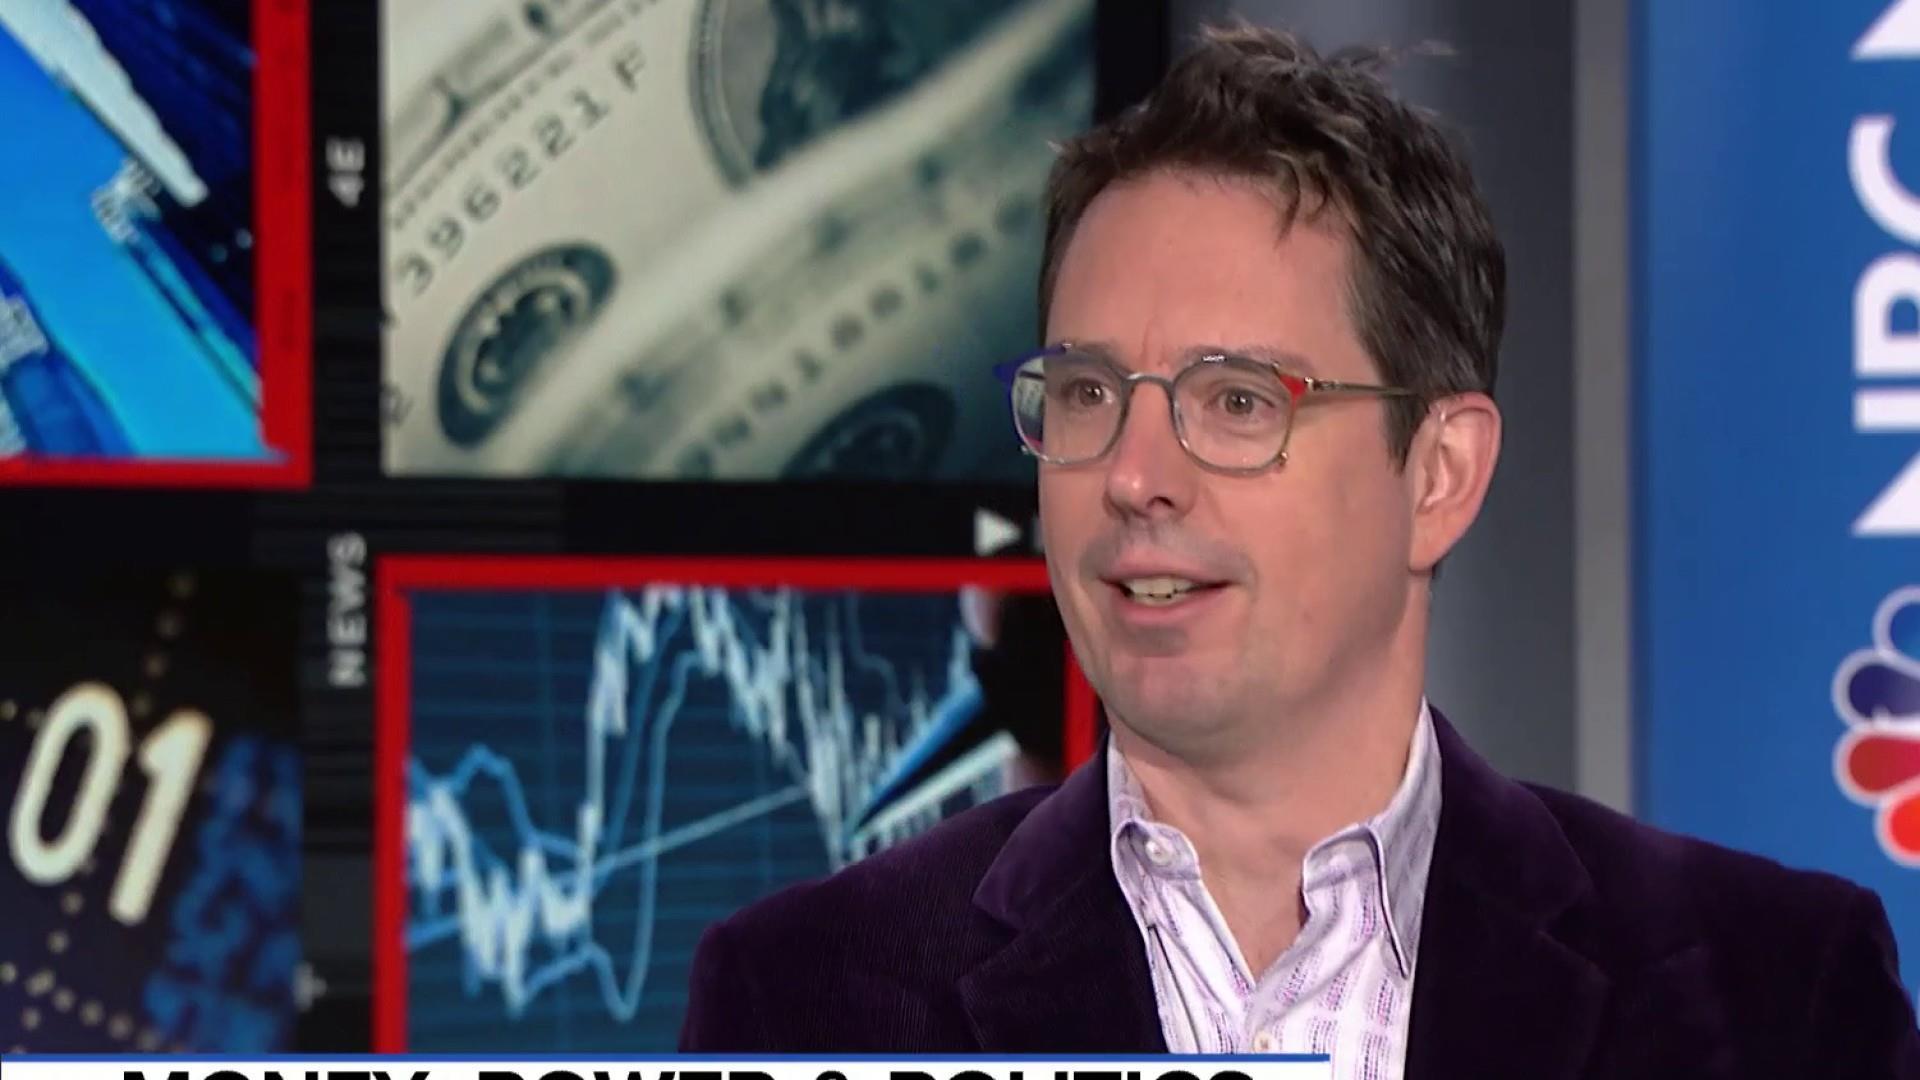 Trump congratulates USA for stock market gains